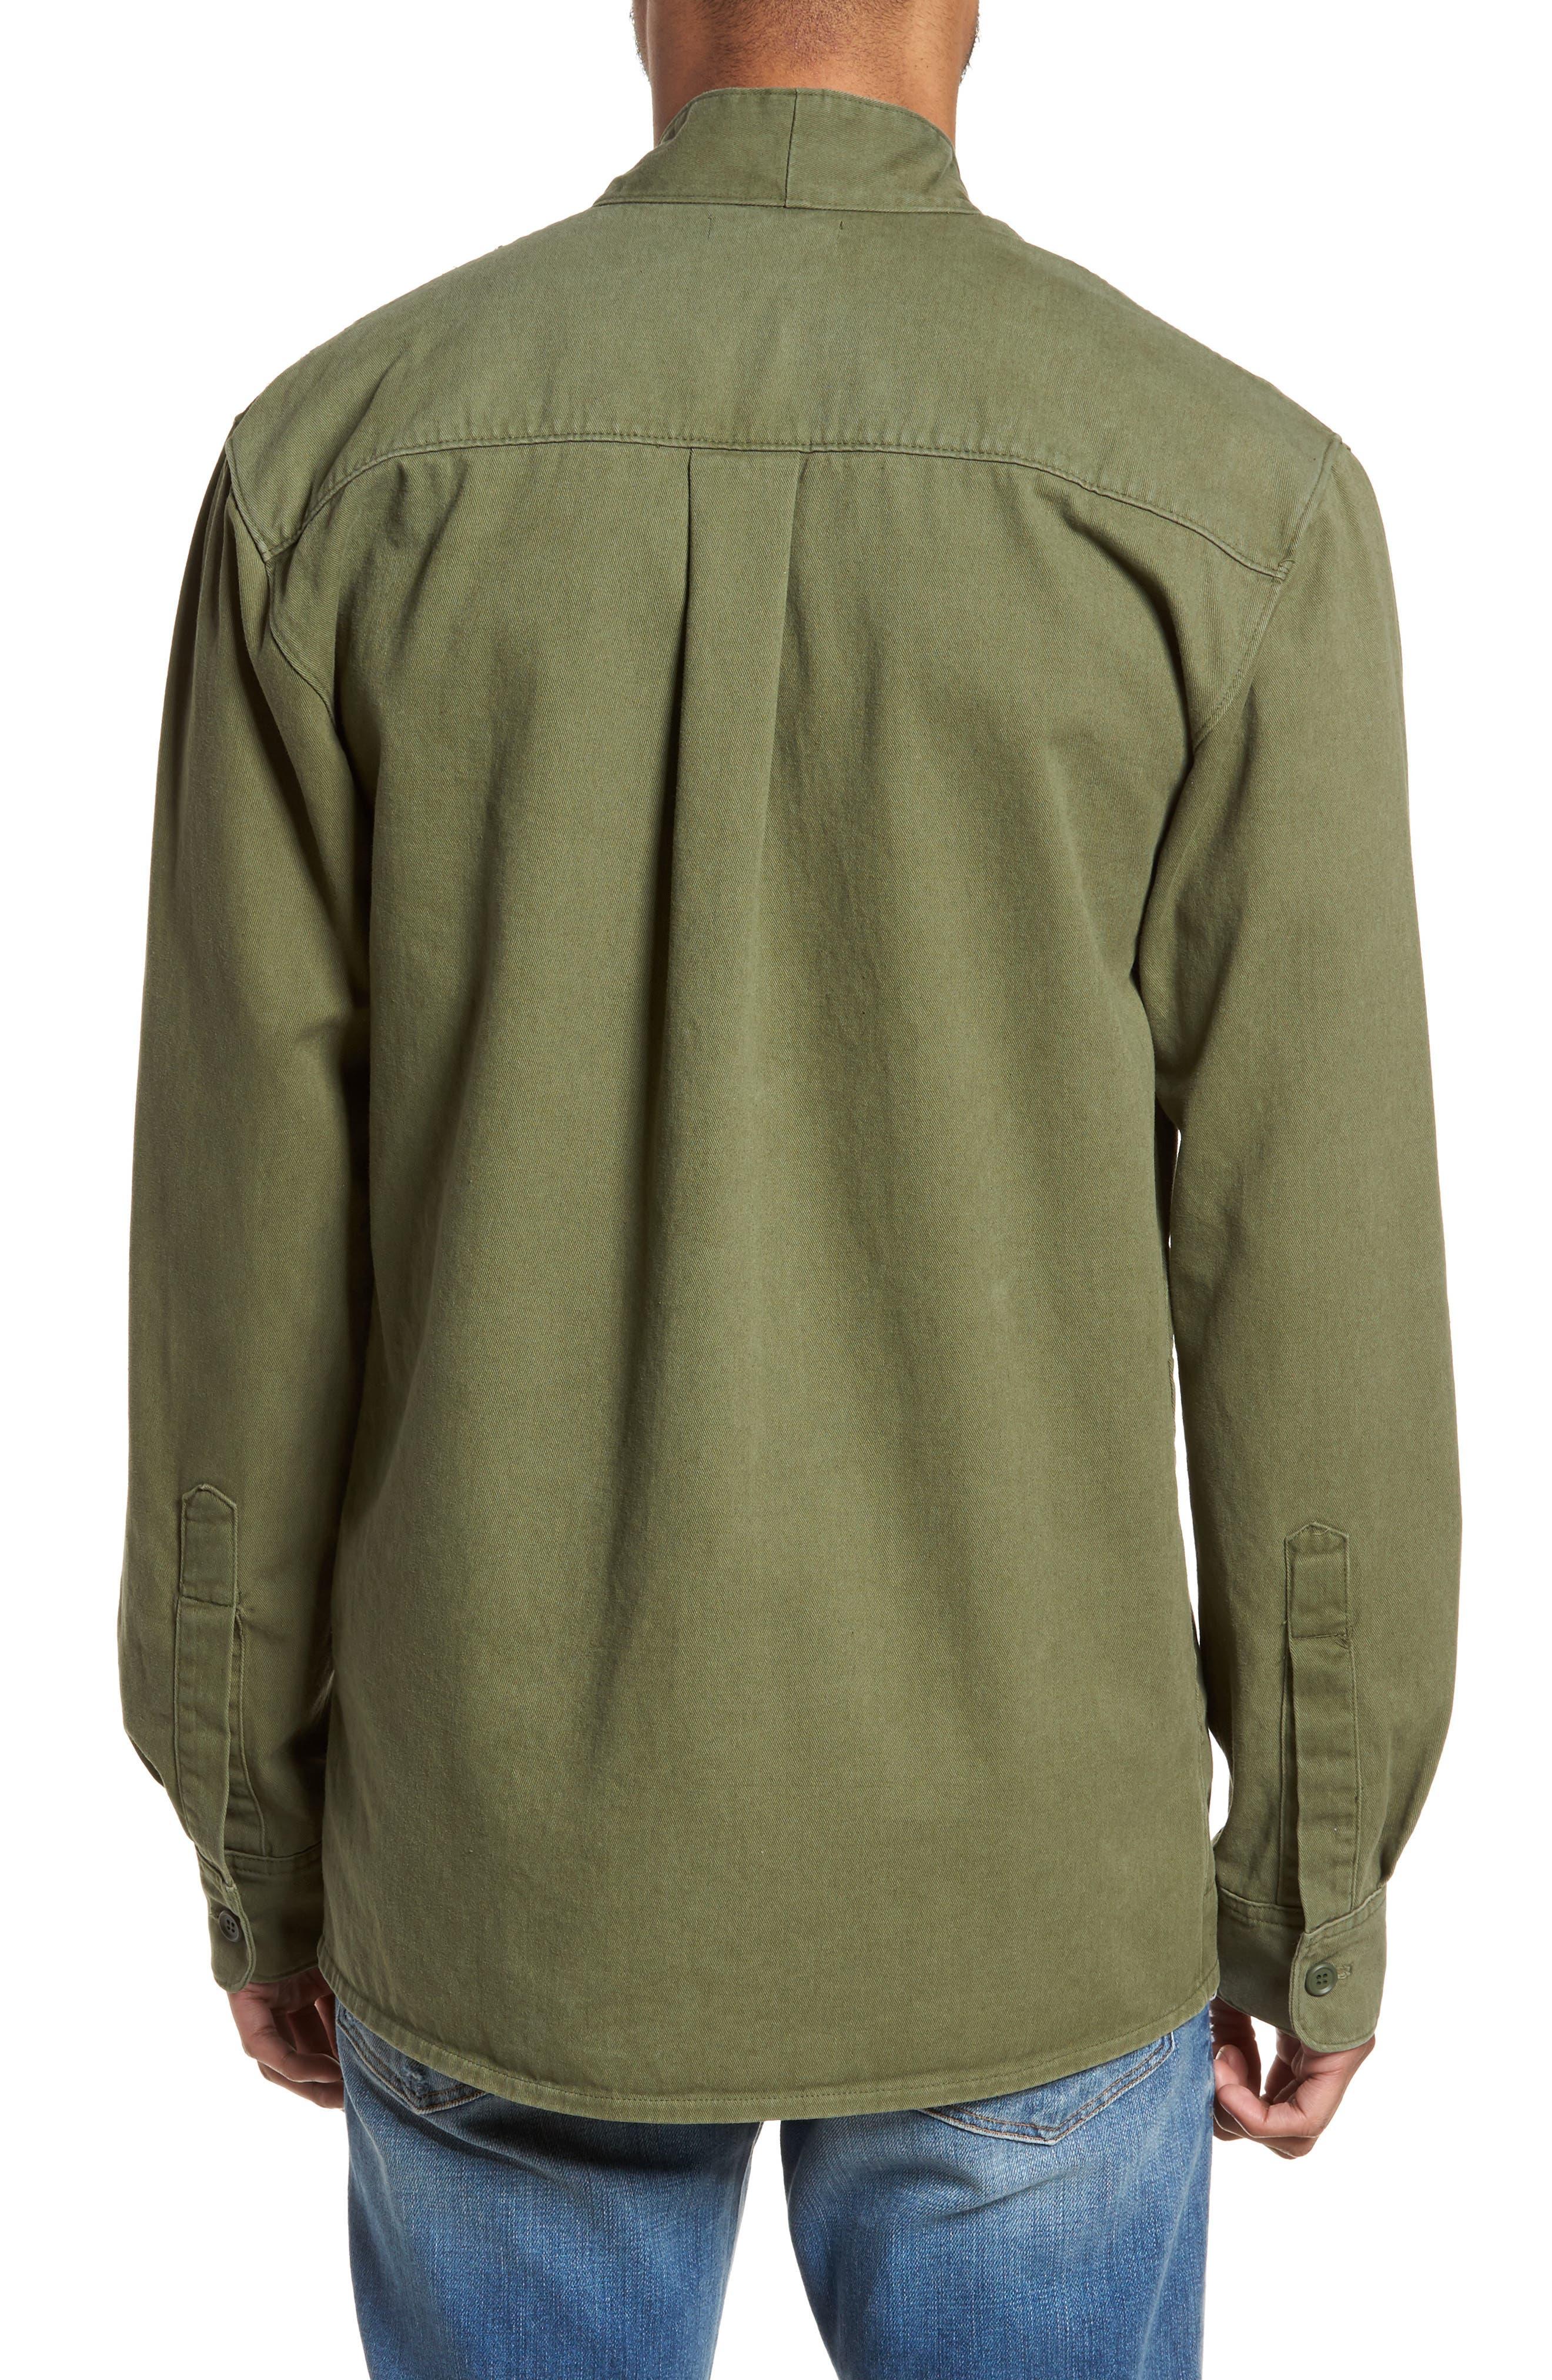 Woven Kimono Cardigan,                             Alternate thumbnail 2, color,                             Green Moss